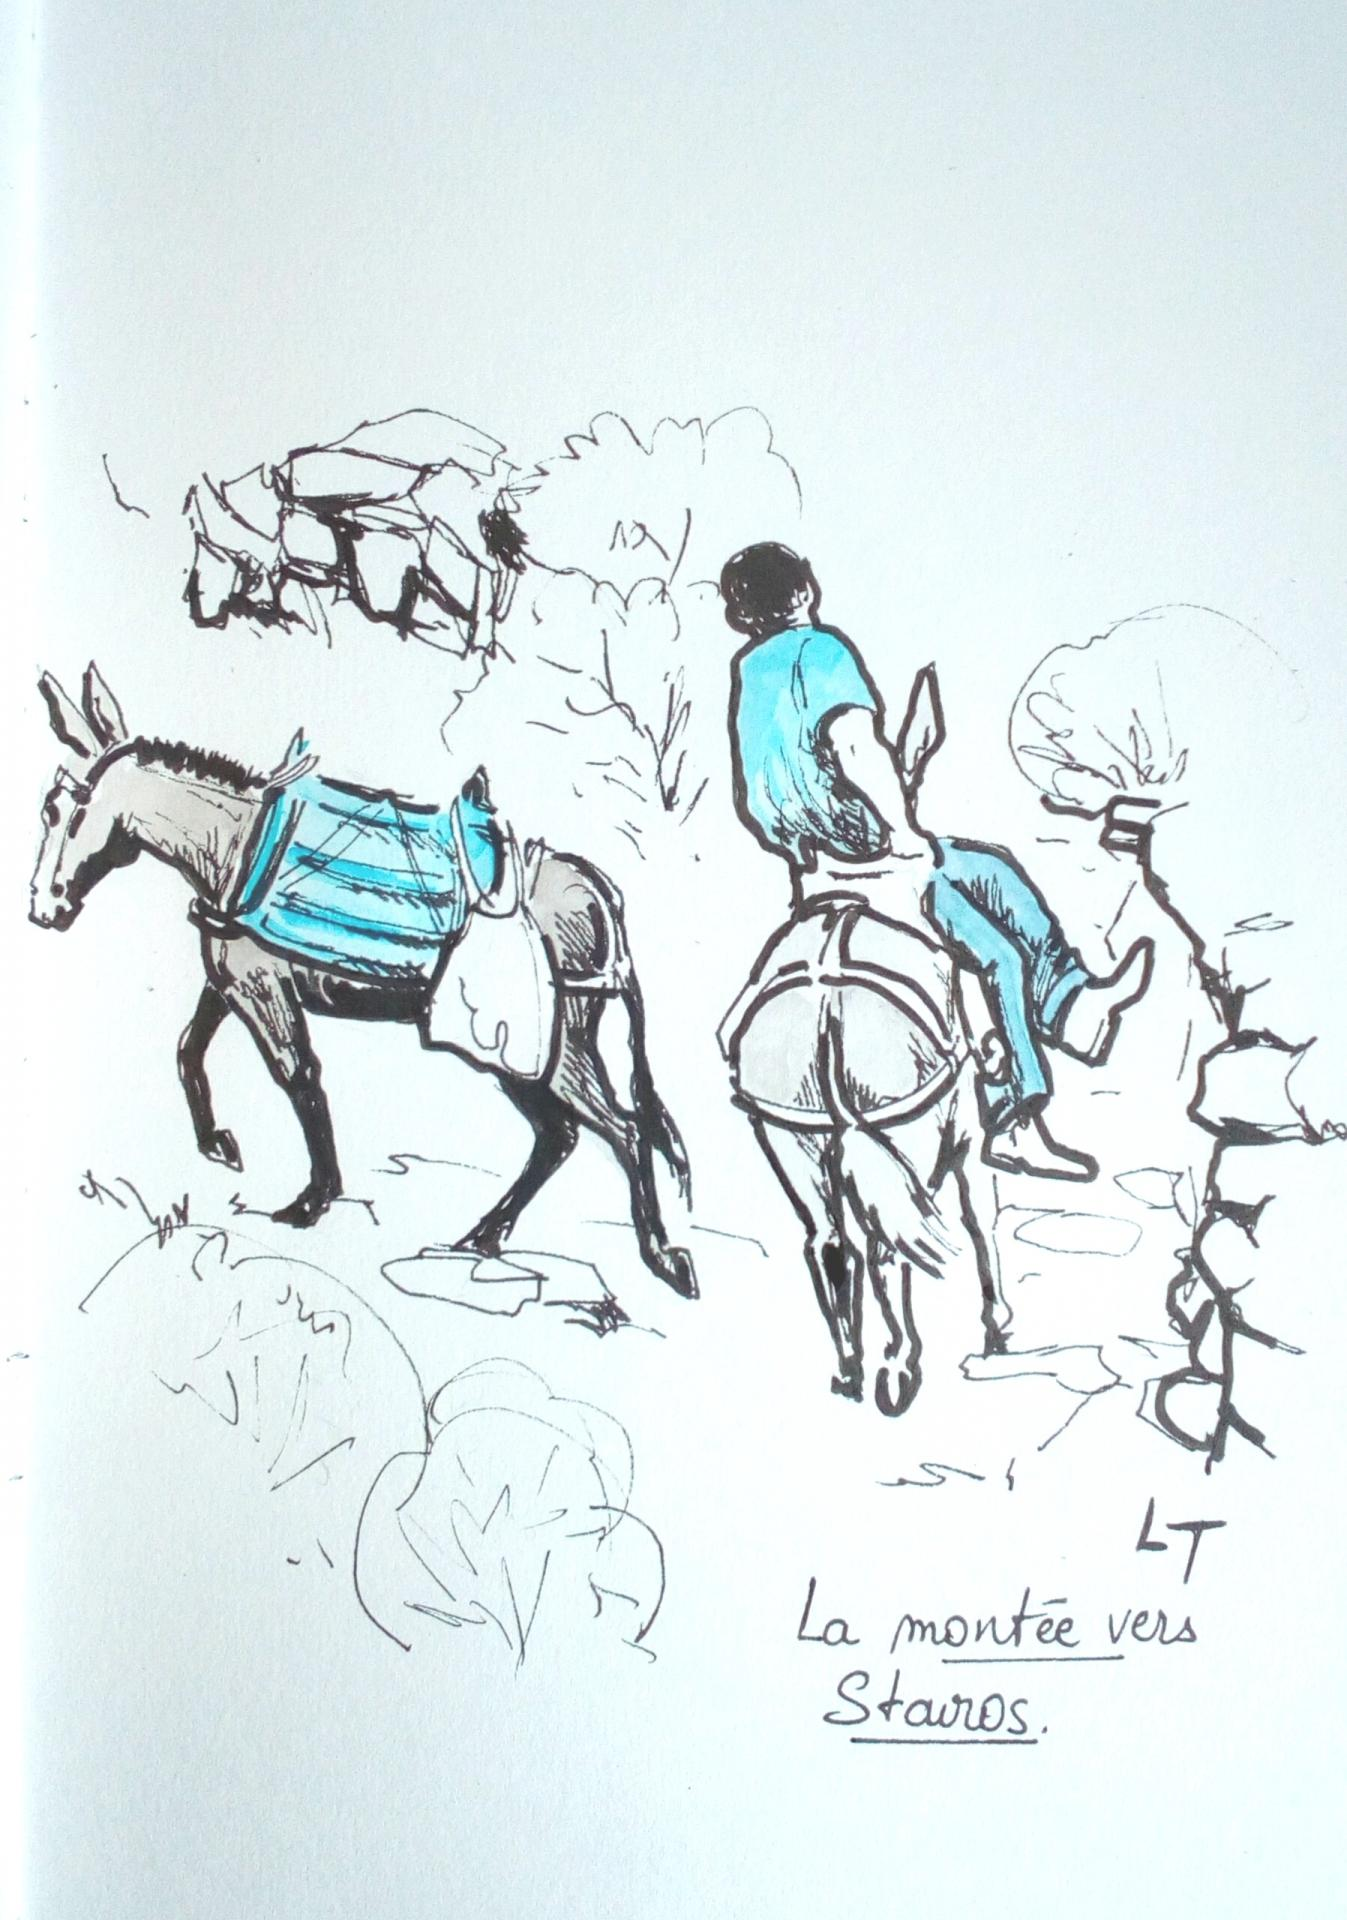 Amorgos, montée vers Stavros